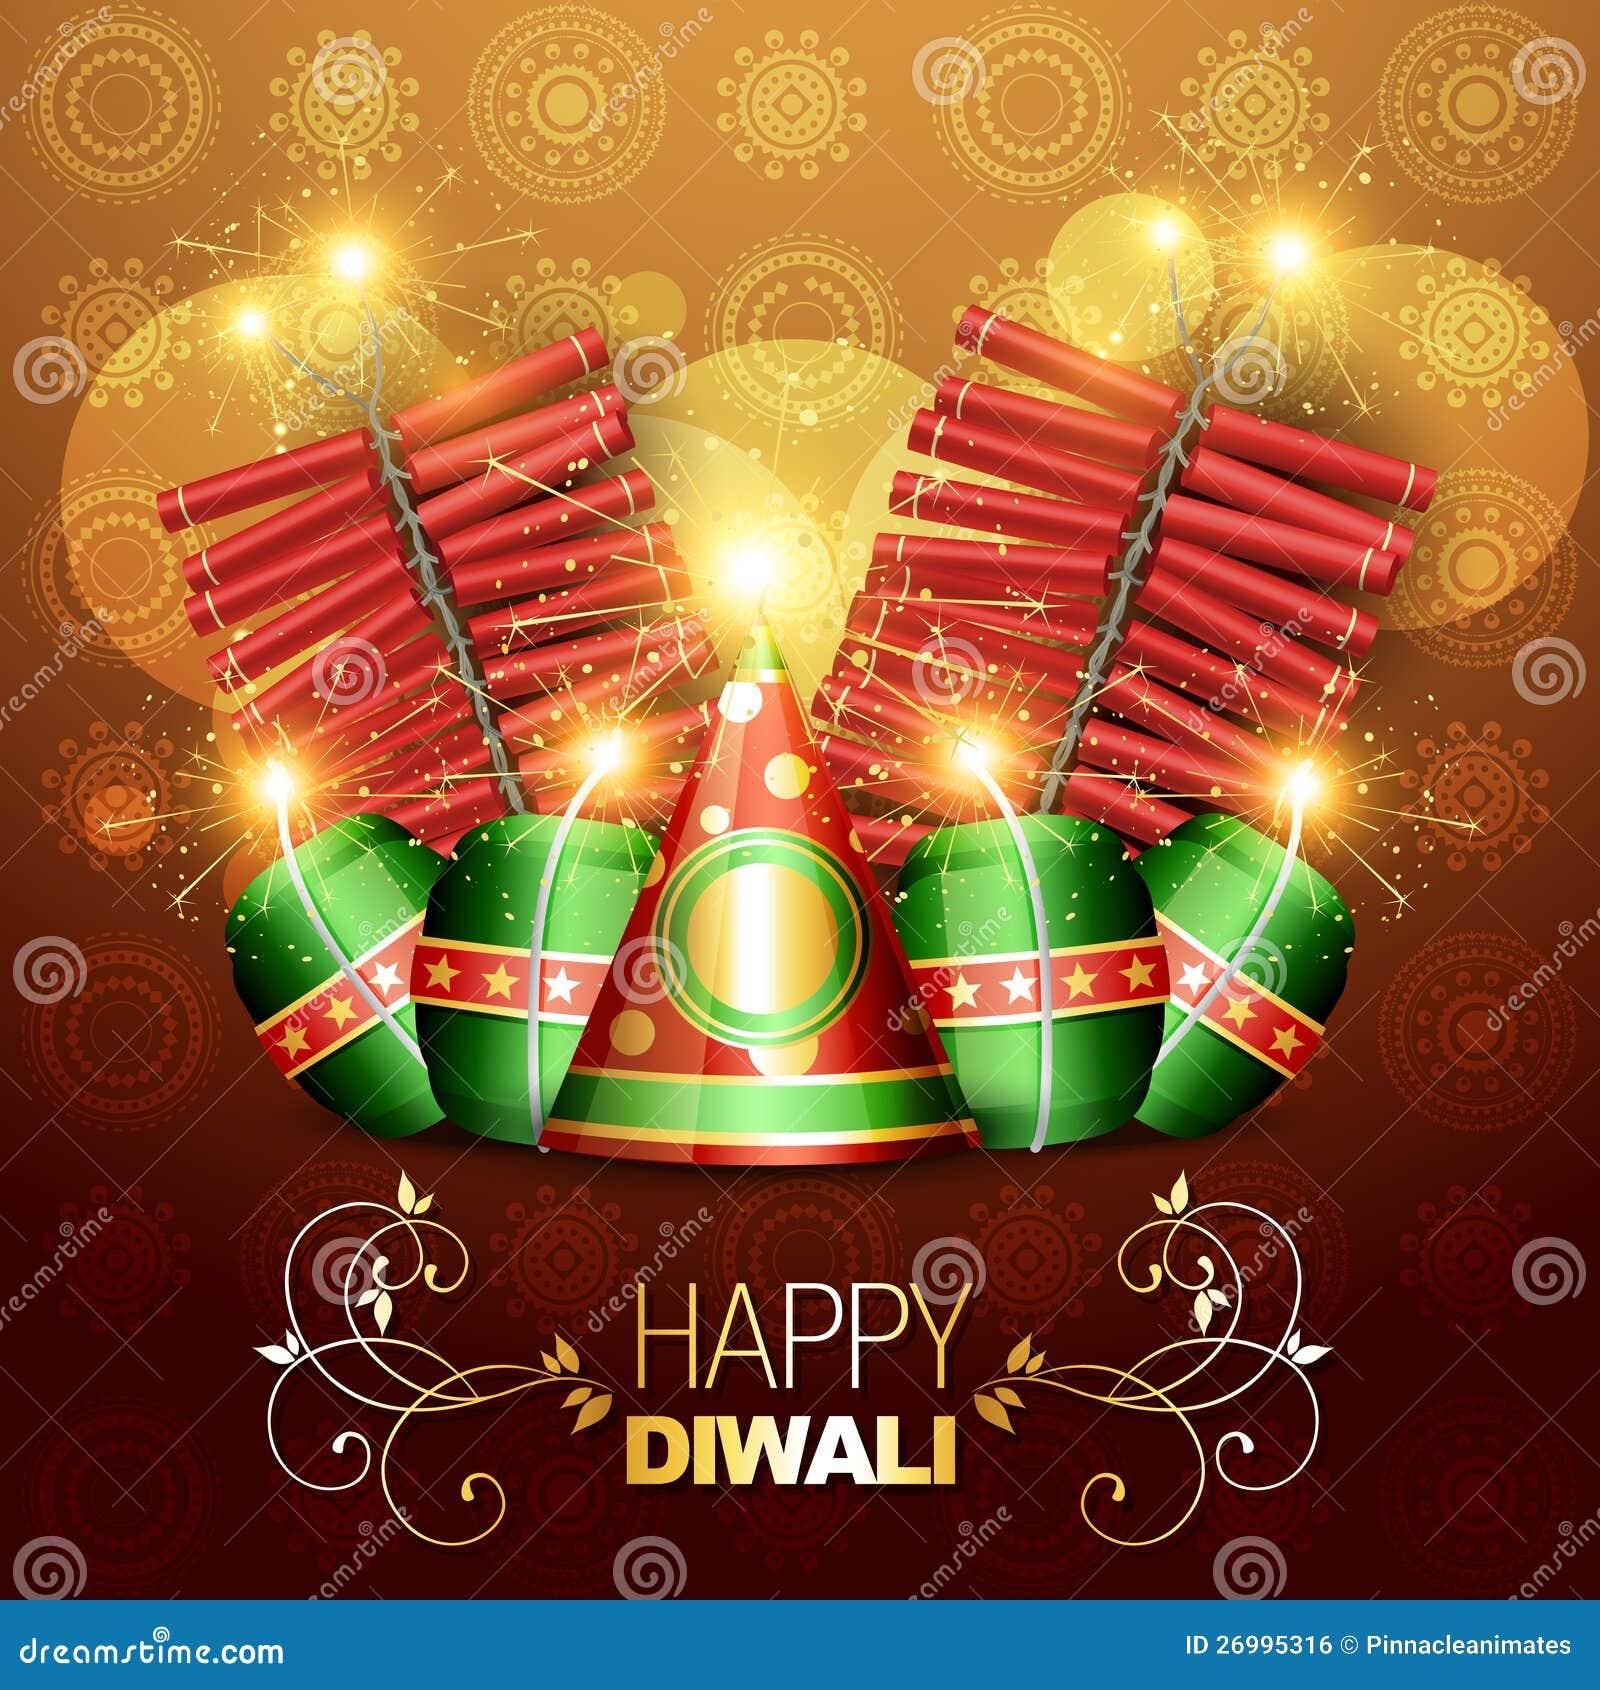 diwali festival wallpaper download